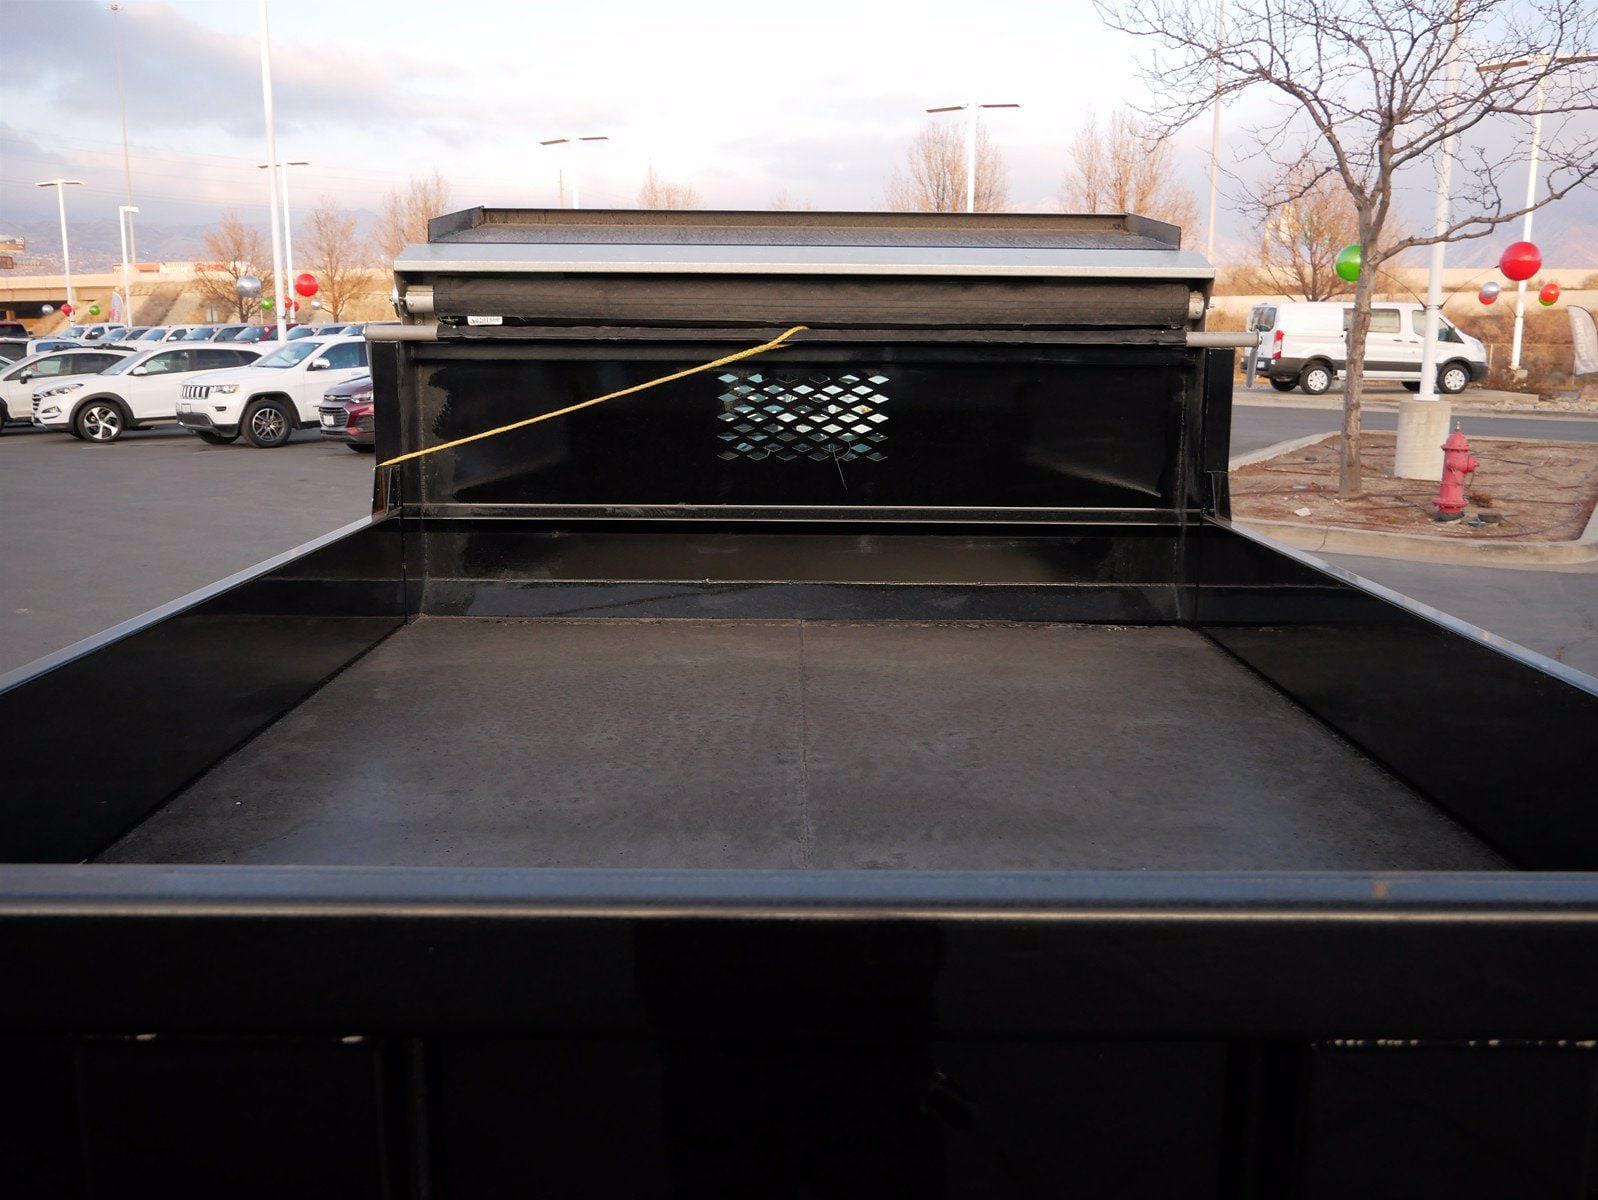 2021 Ford F-550 Regular Cab DRW 4x4, Scelzi Dump Body #64083 - photo 27